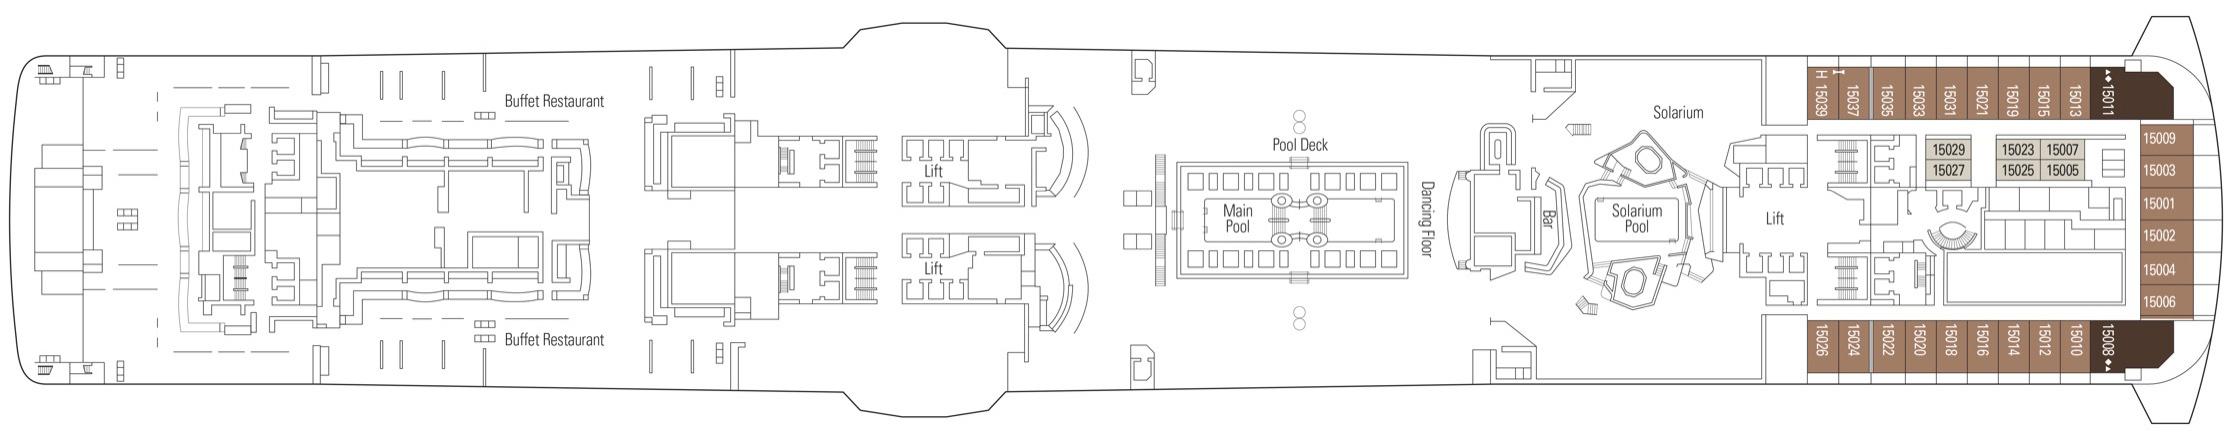 MSC Cruises MSC Meraviglia Deck 15.jpg